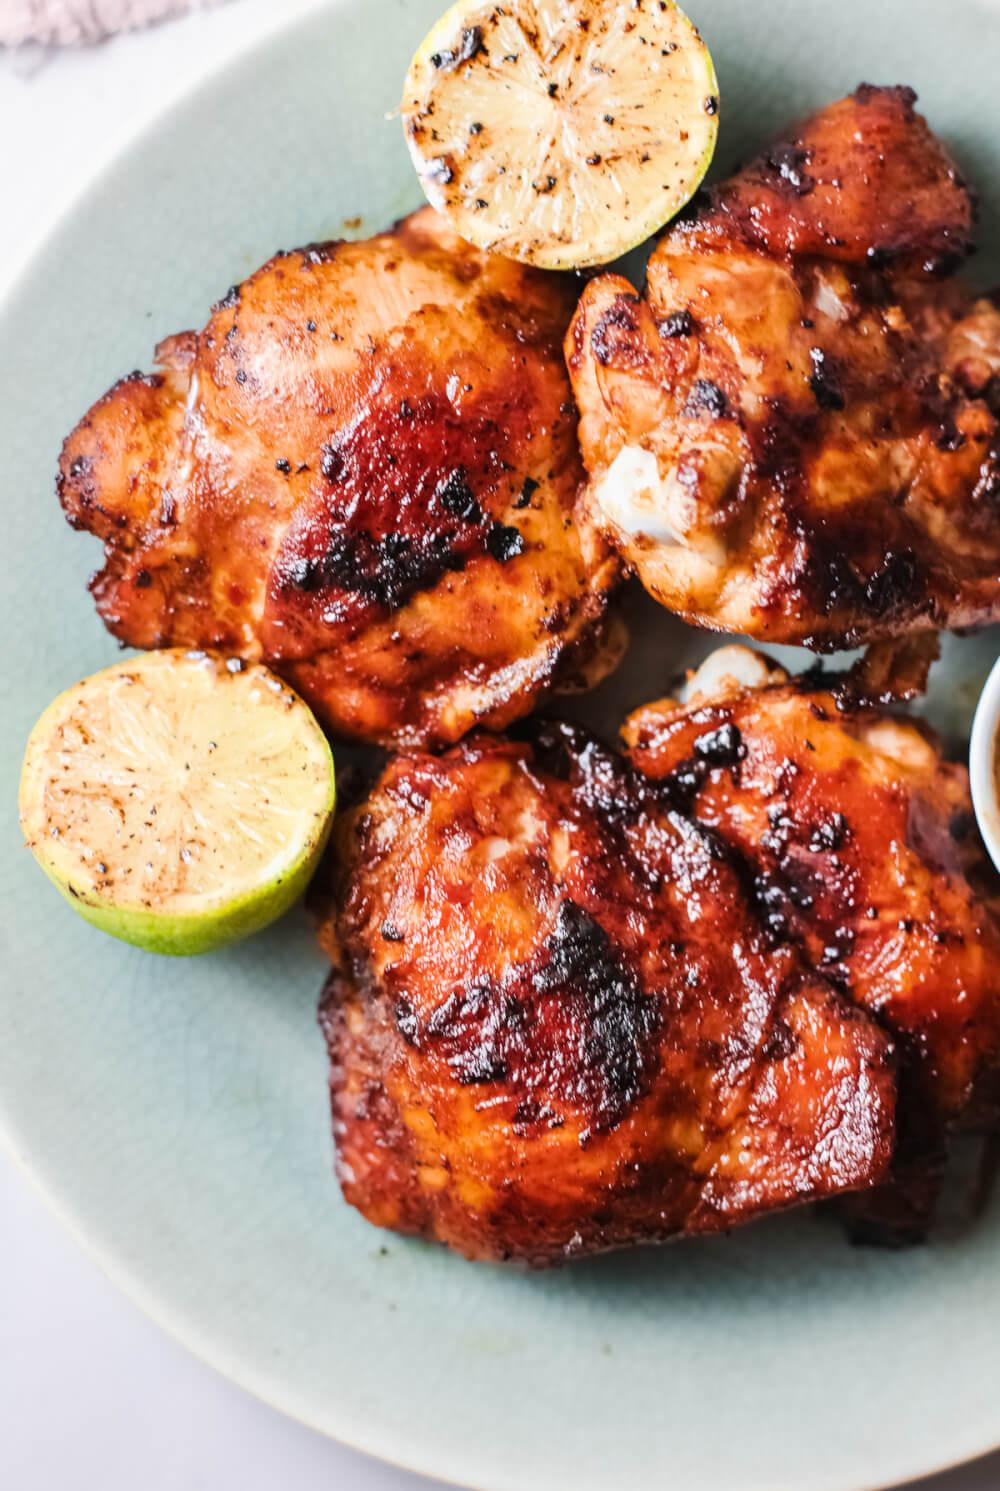 Baked Huli Huli Chicken Recipe featured by top Hawaii blog, Hawaii Travel with Kids. | huli huli chicken recipe oven